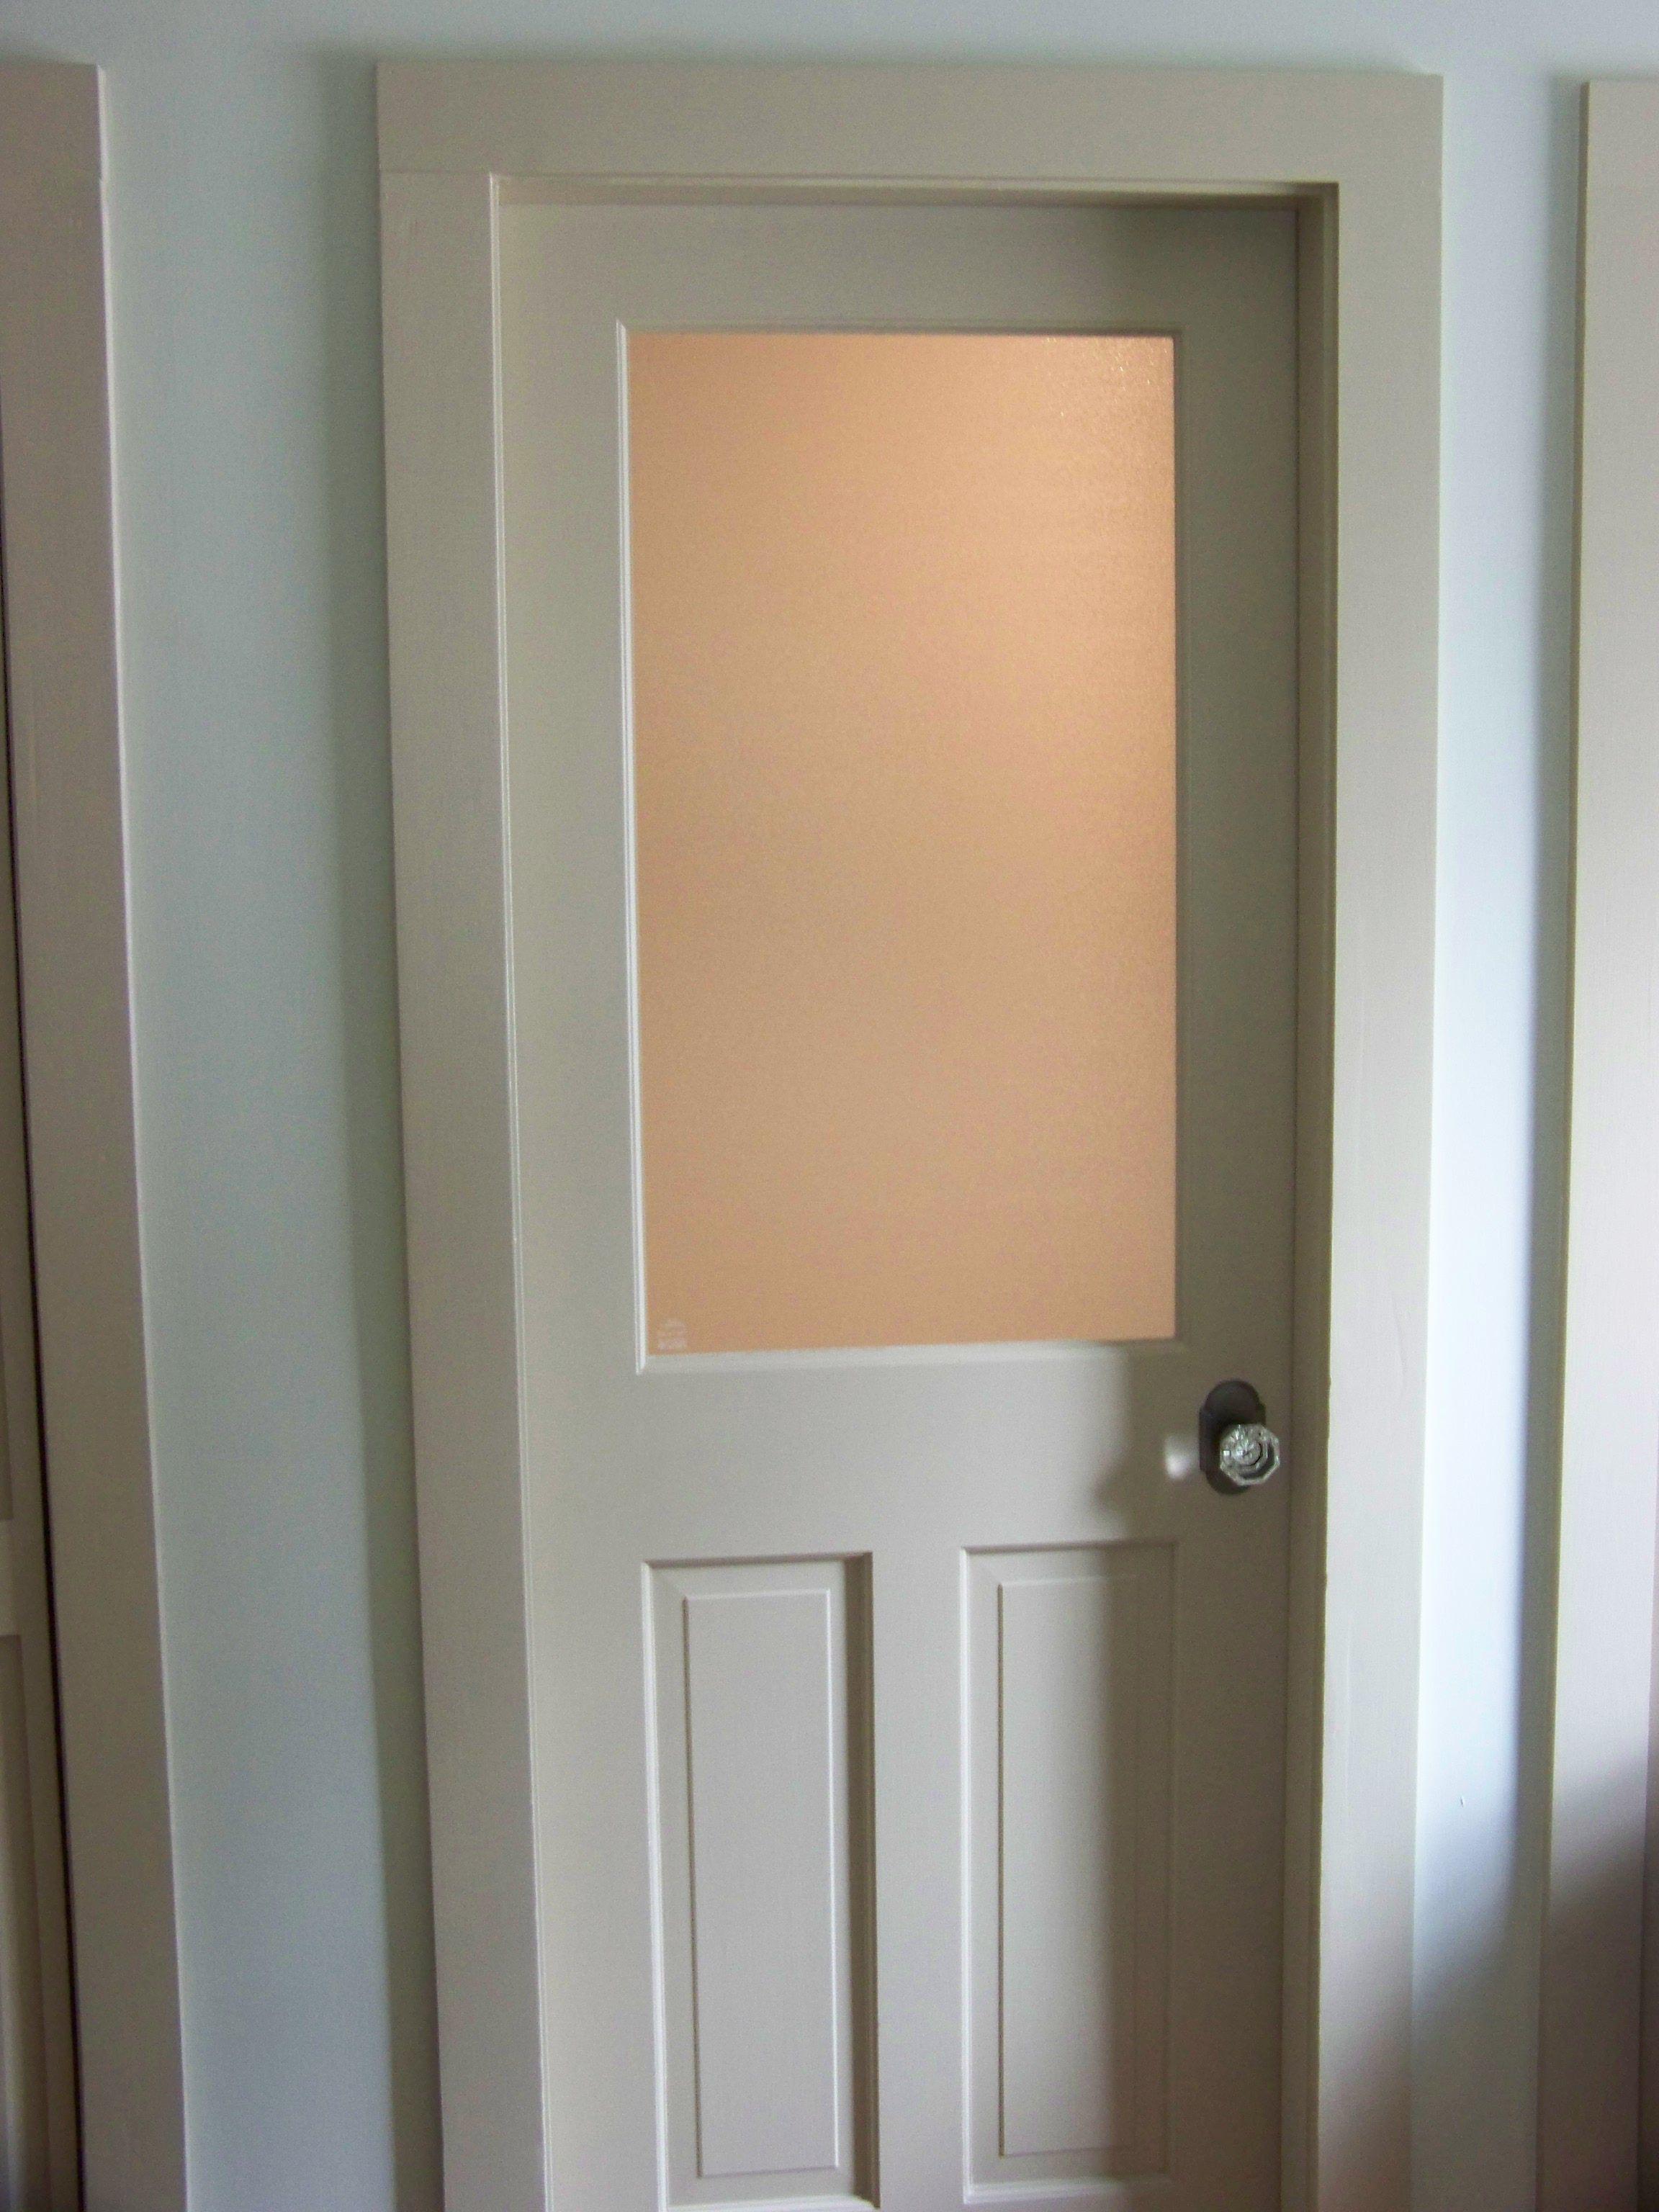 Glass Panel Interior Doors Interior Bathroom Exceptional Half Glass pertaining to measurements 2304 X 3072